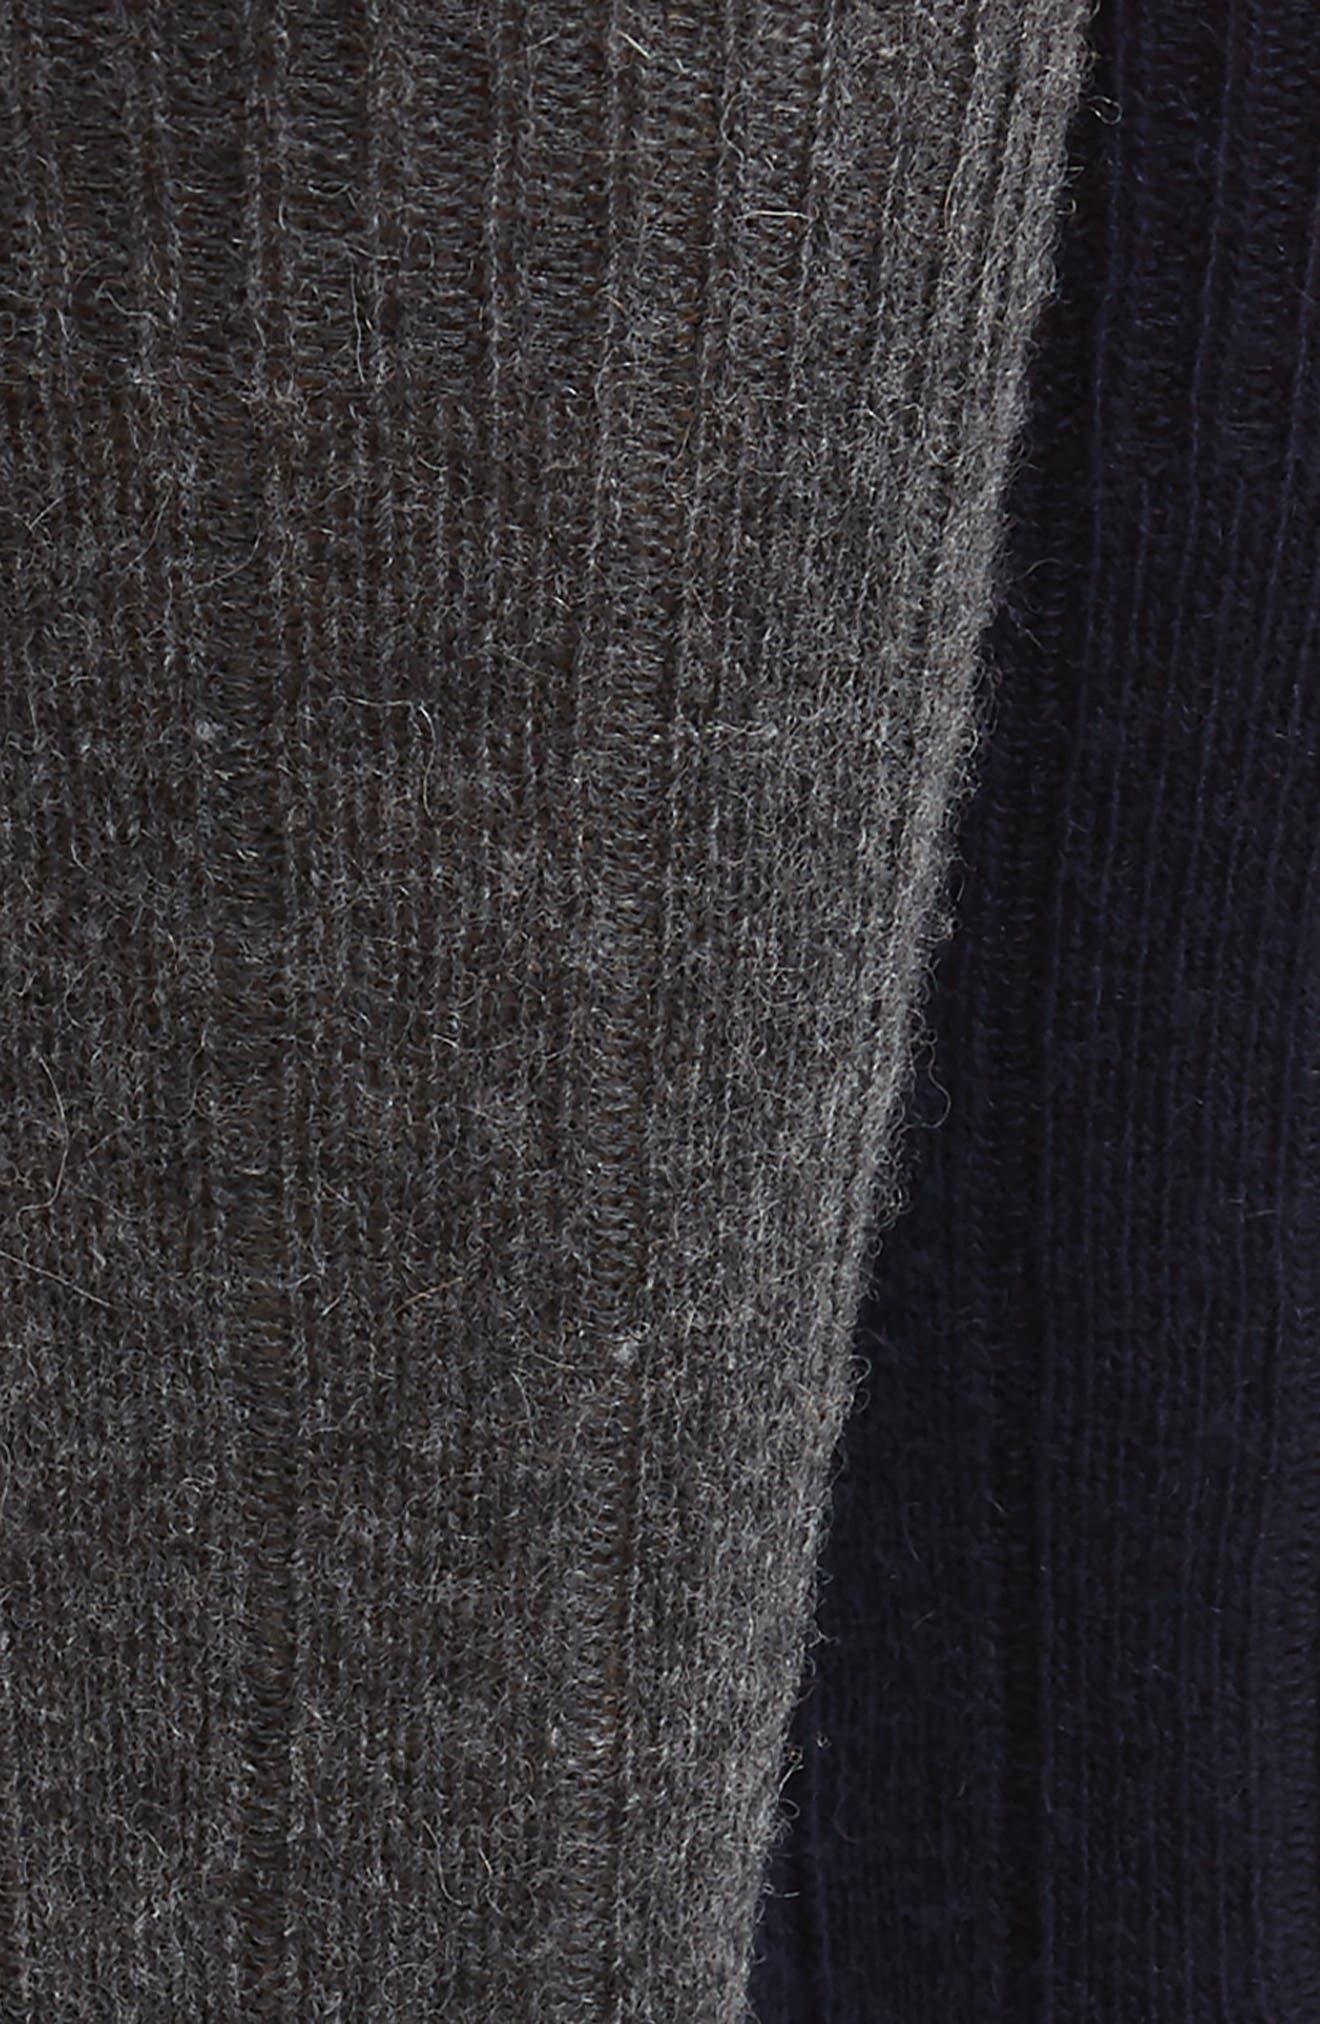 2-Pack Cashmere Blend Socks Box Set,                             Alternate thumbnail 2, color,                             Navy/ Charcoal